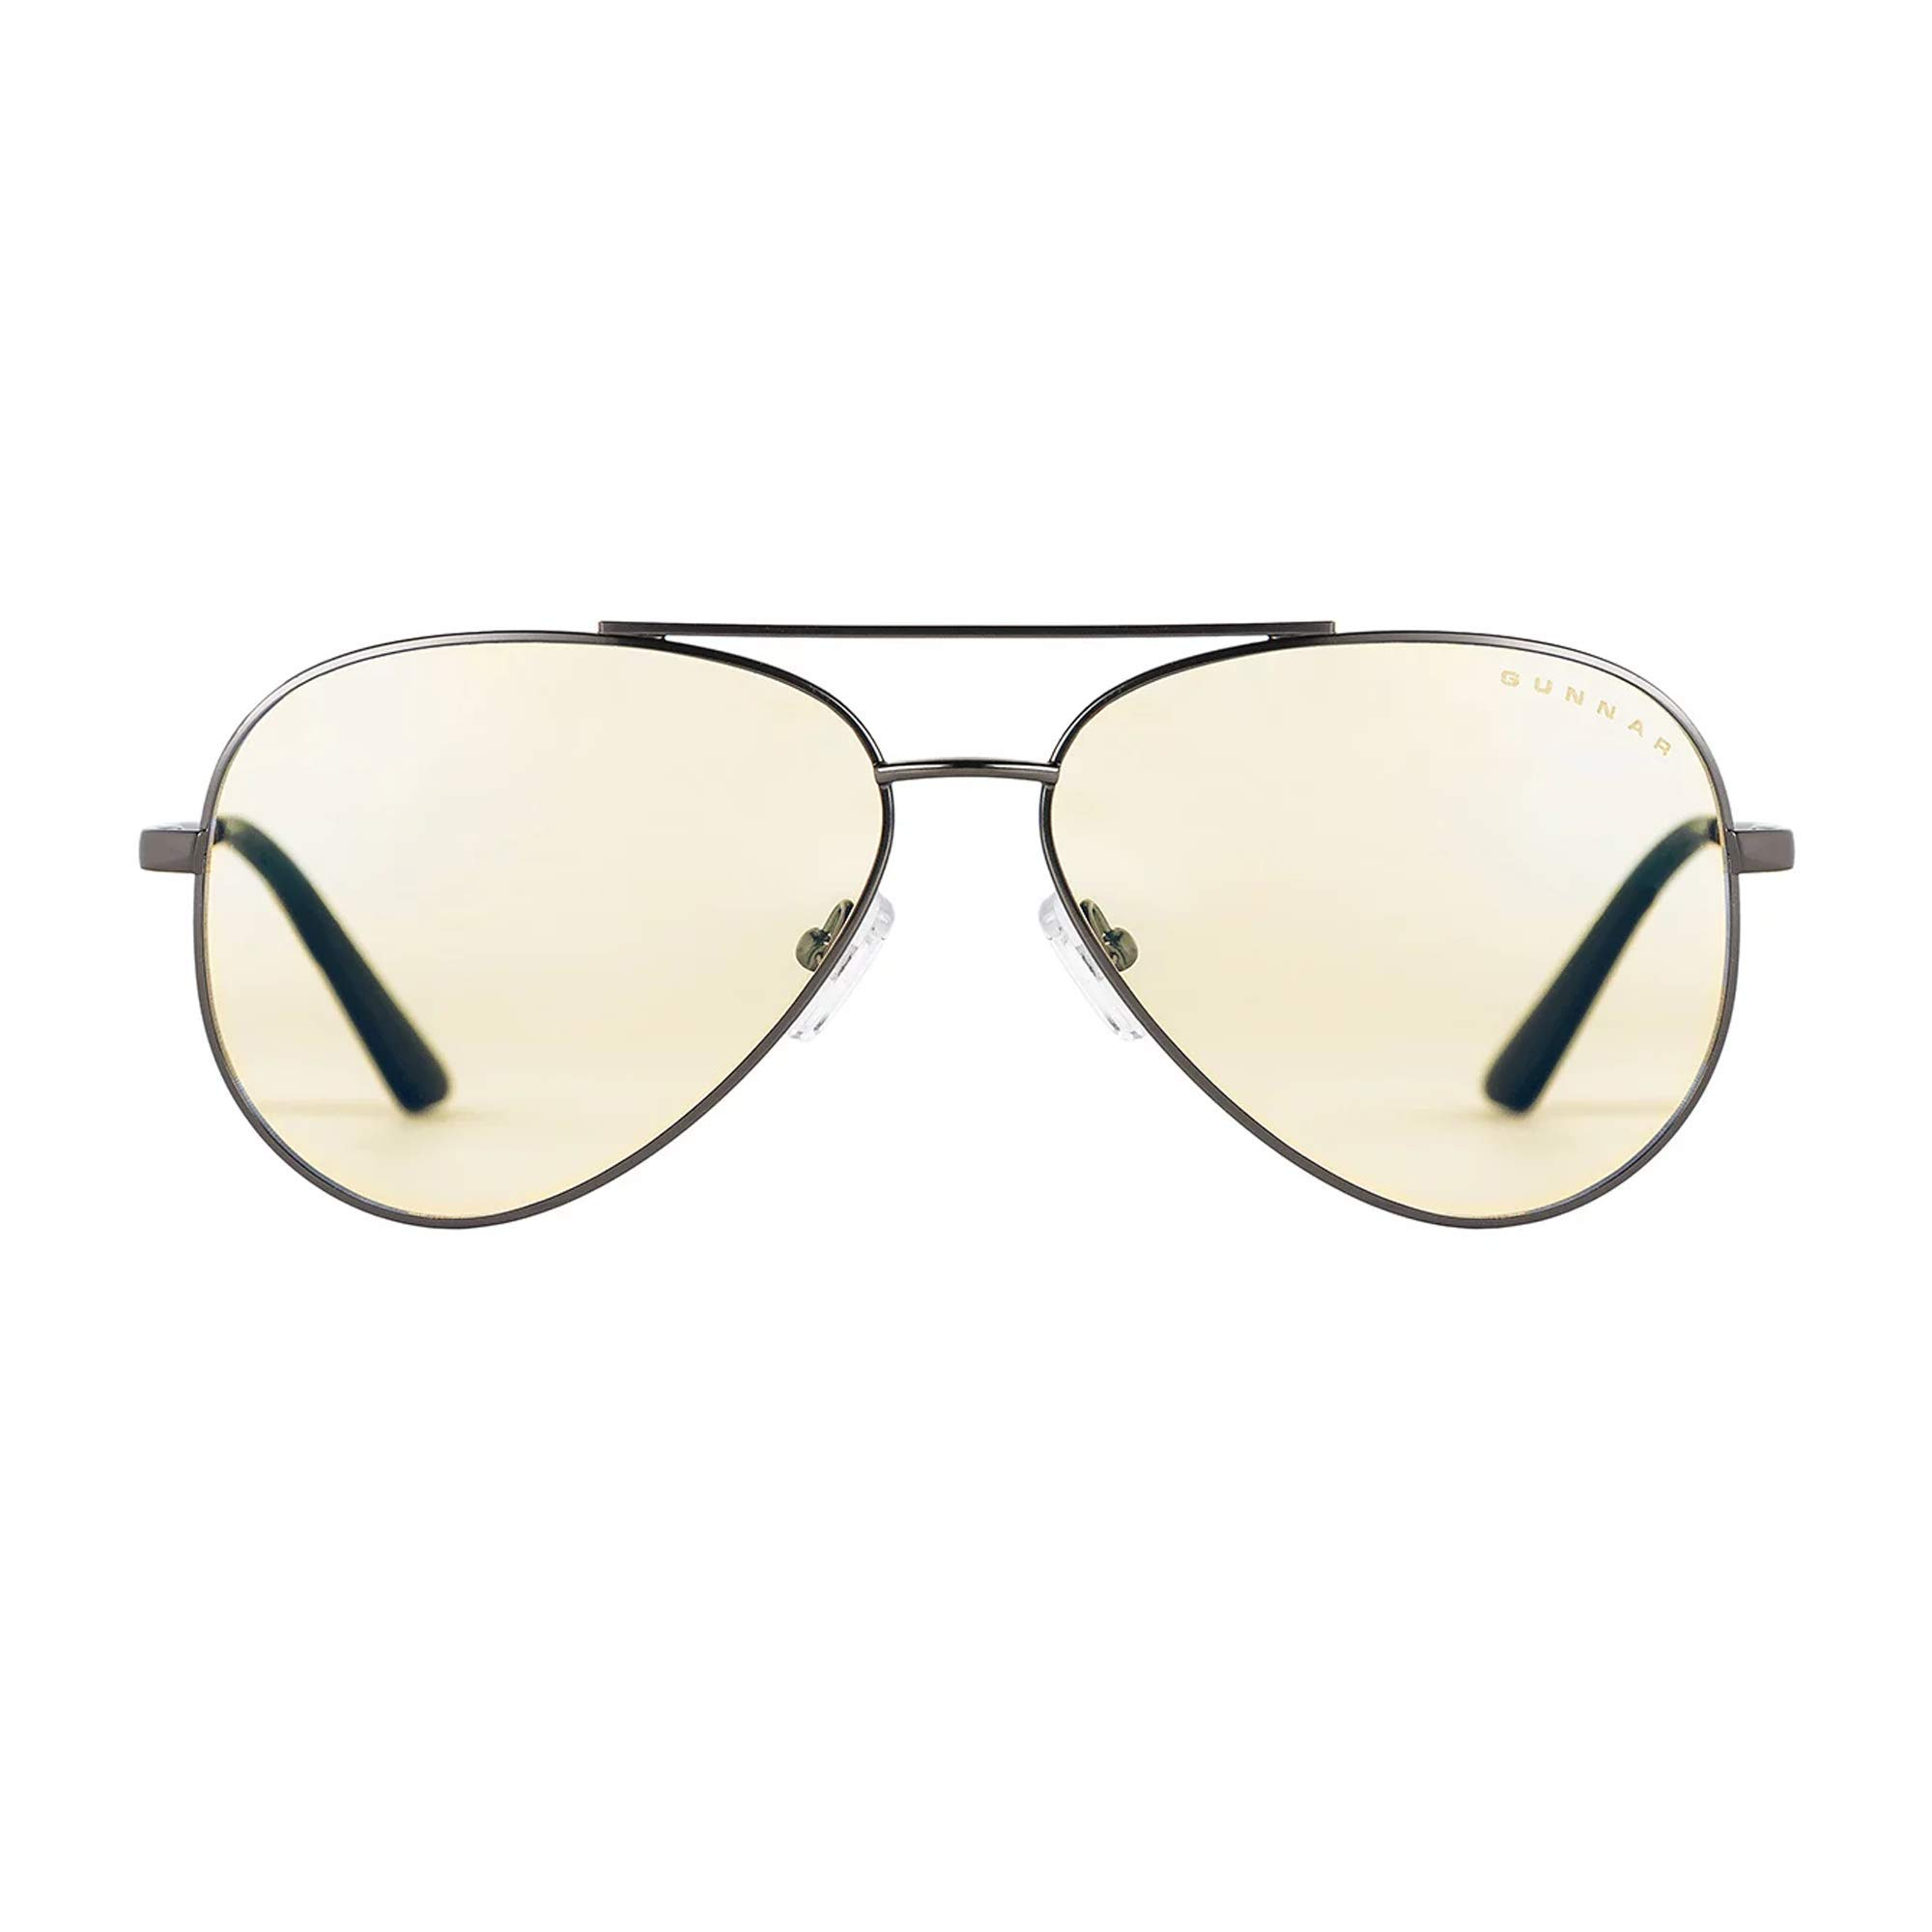 GUNNAR Gaming and Computer Eyewear/Maverick, Clear Tint - Patented Lens, Reduce Digital Eye Strain, Block 35% of Harmful Blue Light